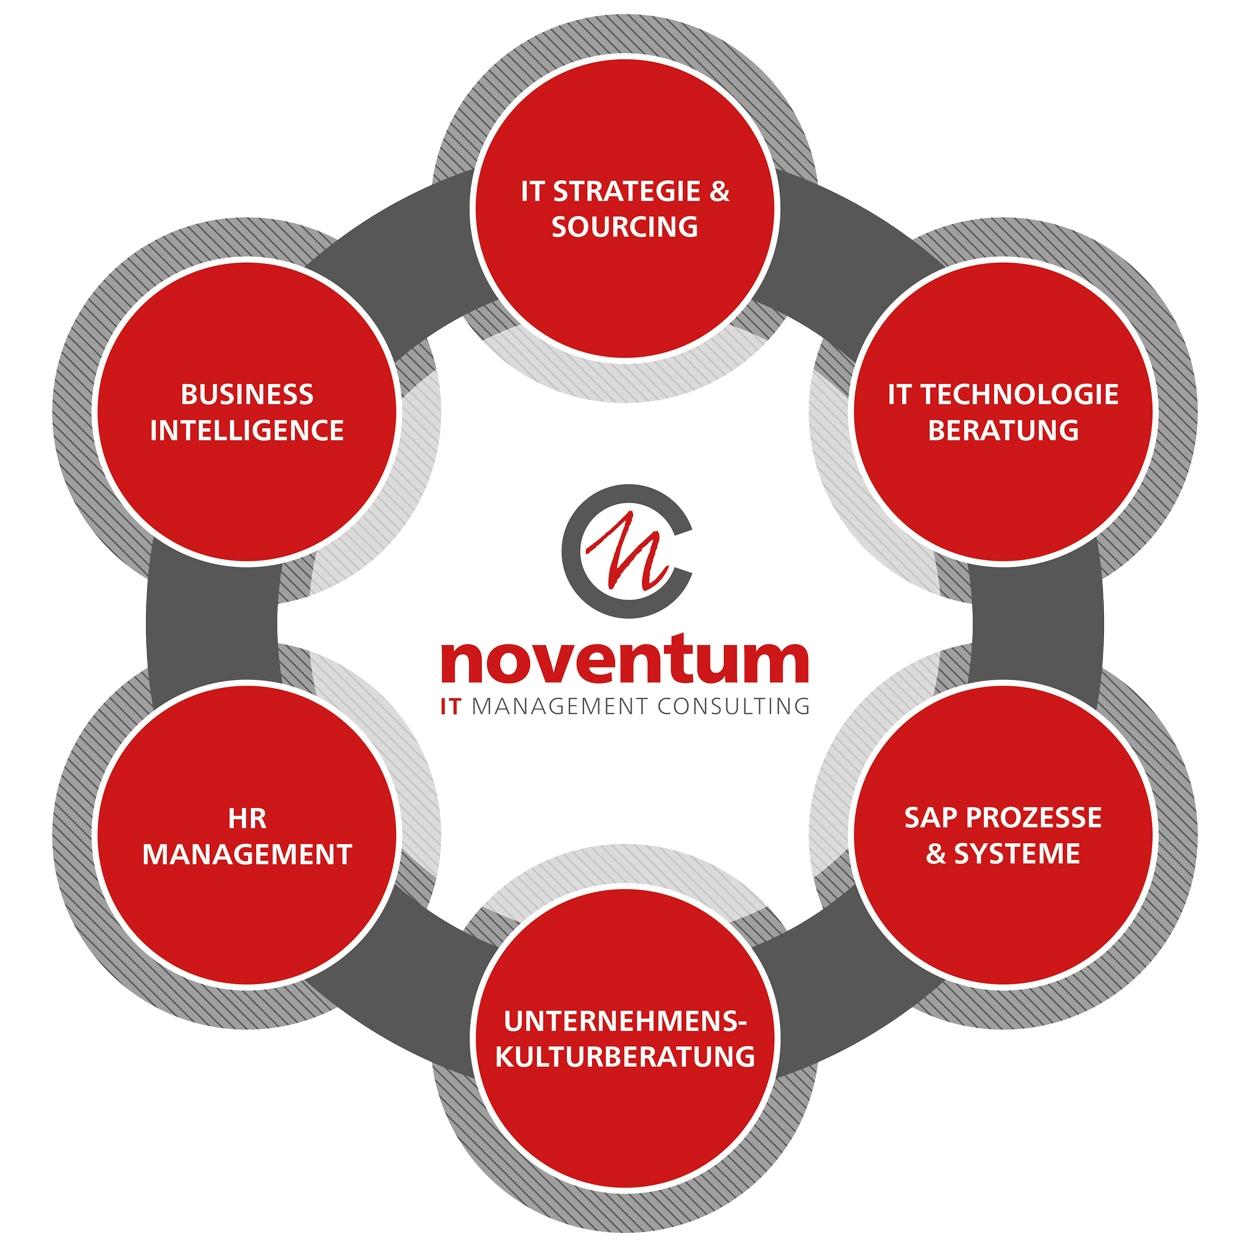 images/images_front/kunden/noventum/produkte_service_leistungen.jpg